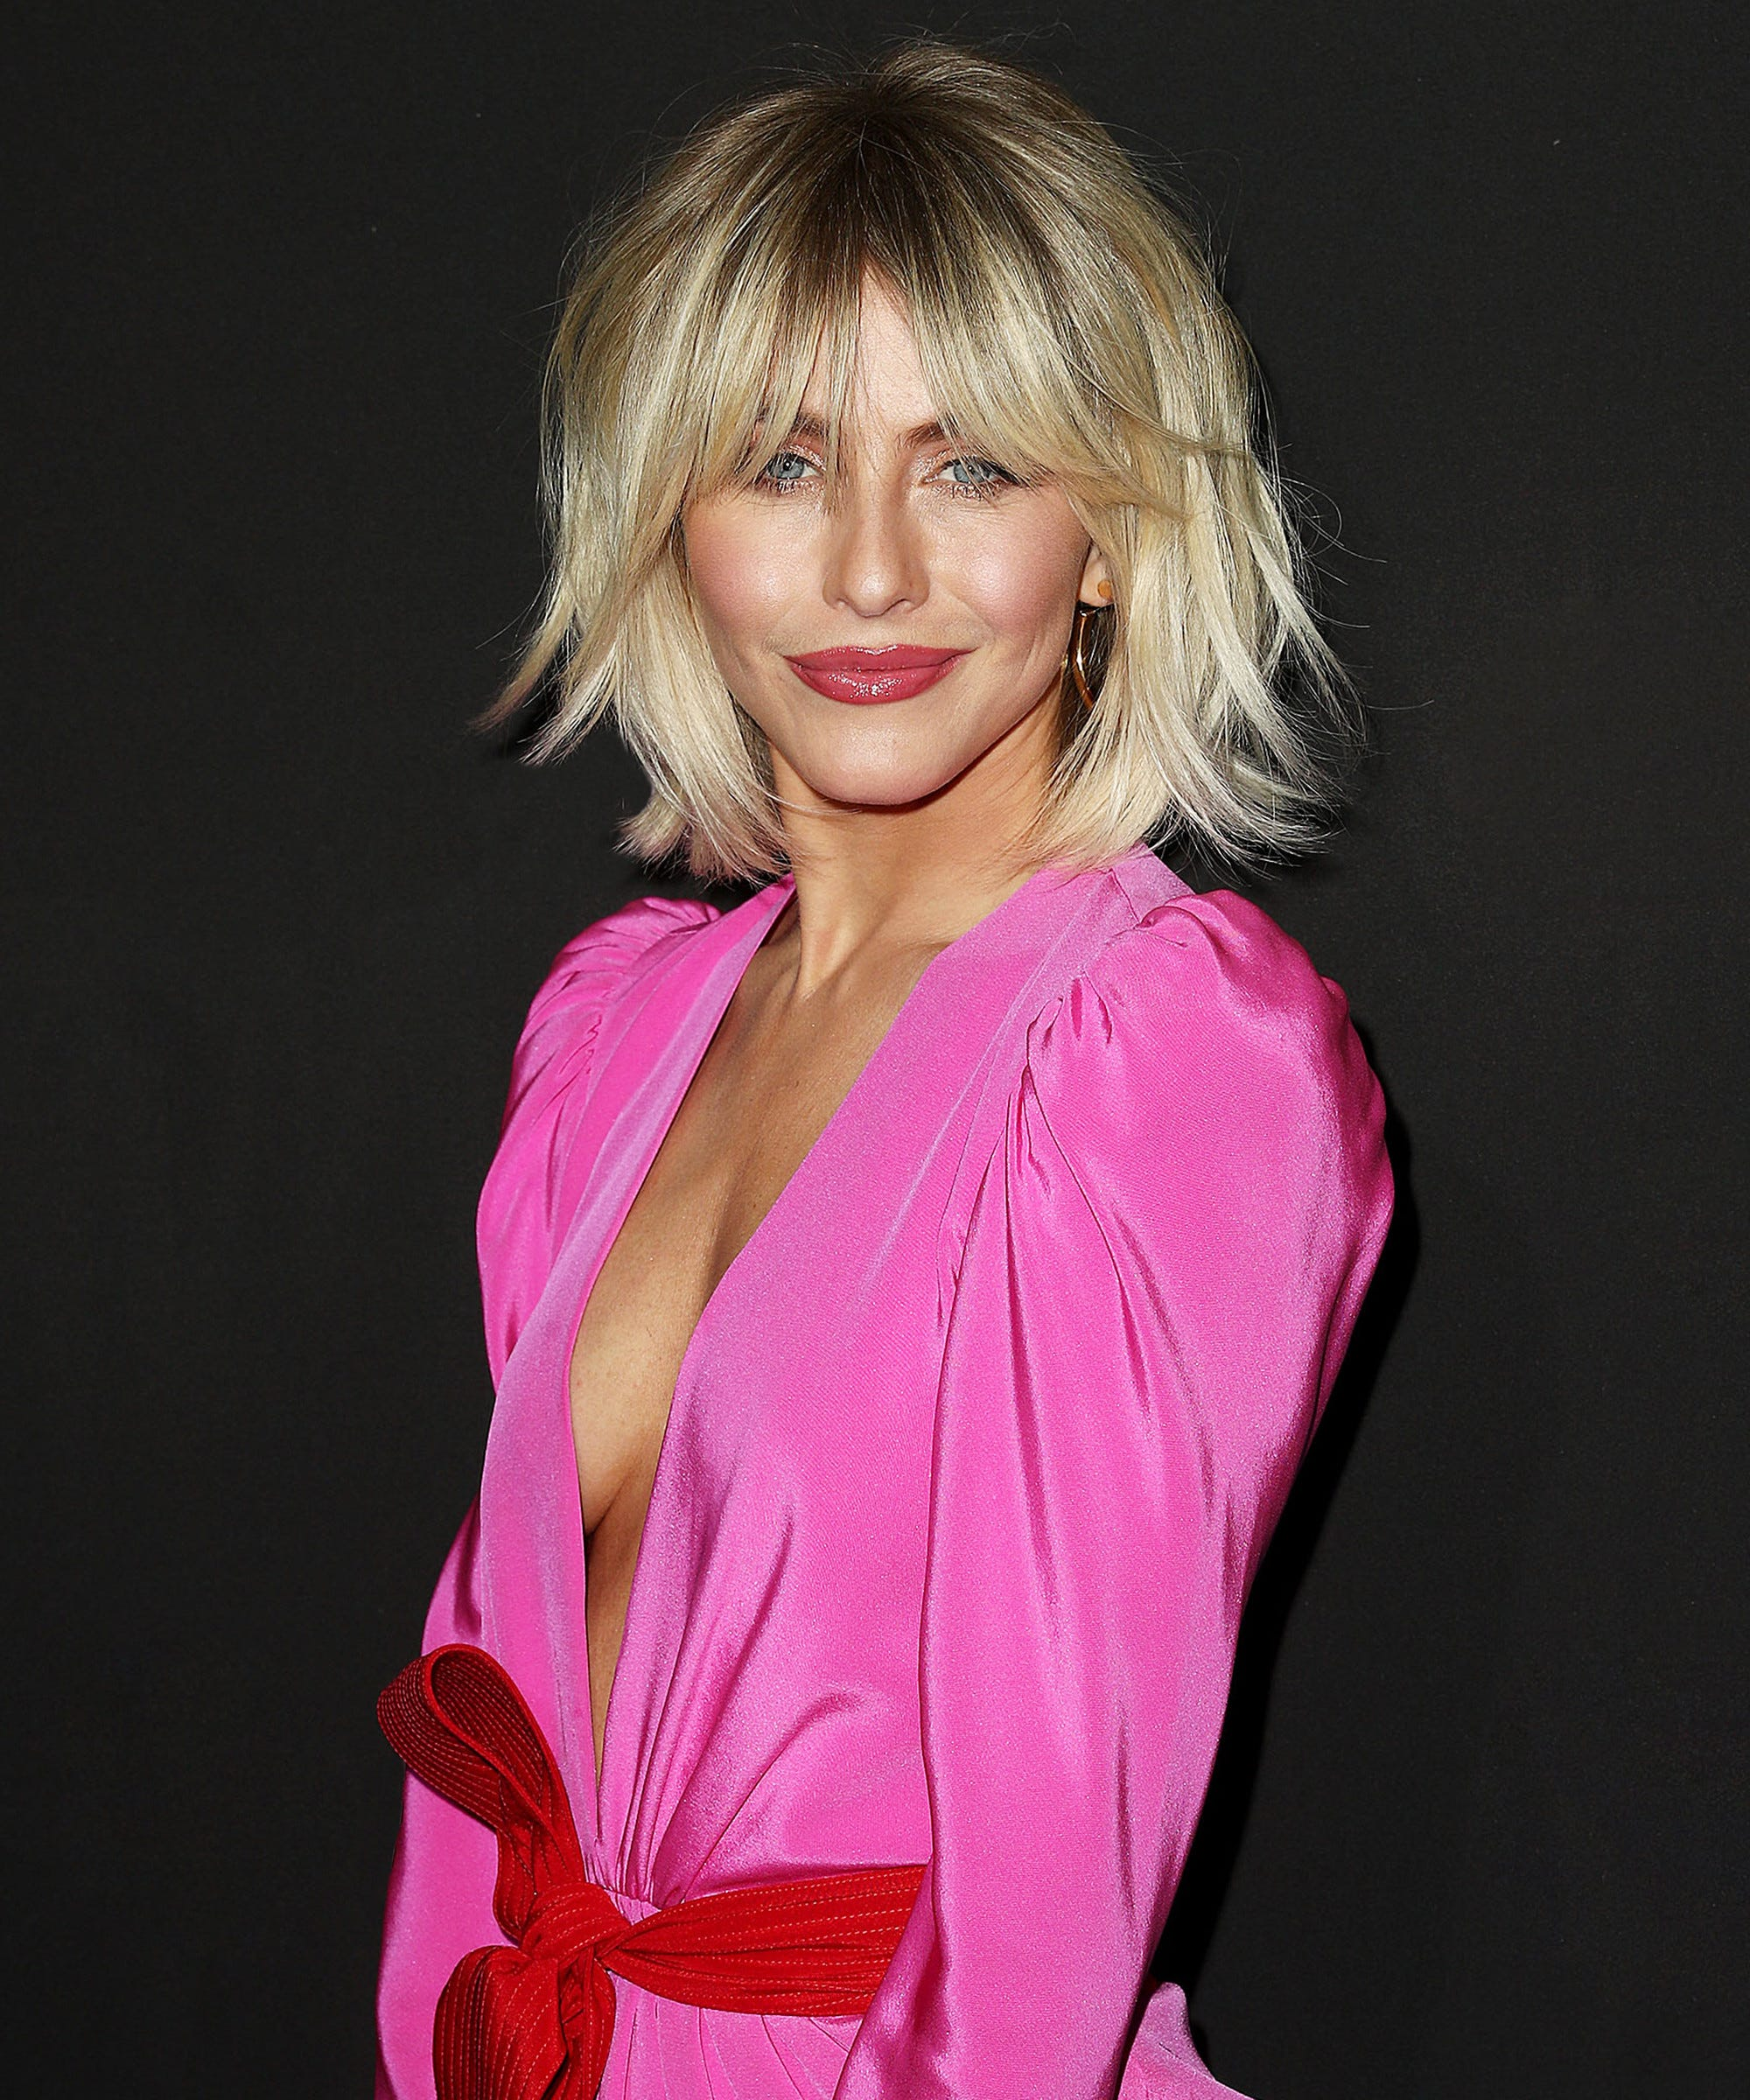 Julianne Hough Gets New Shag Haircut With Bangs